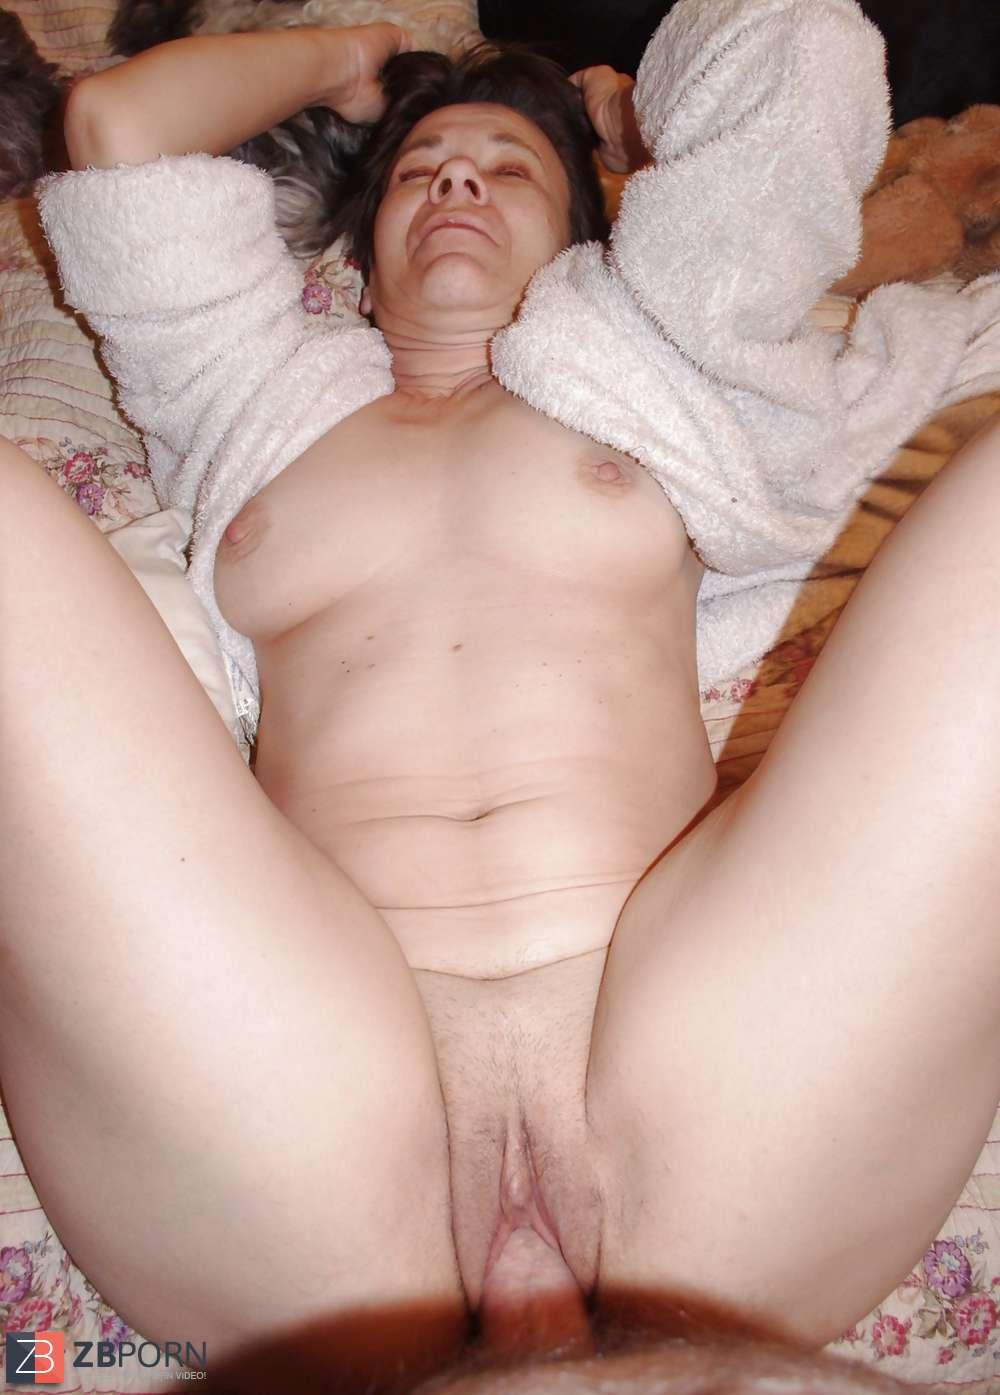 Old Lady Creampie Porn cream pie sex mature - porn archive.